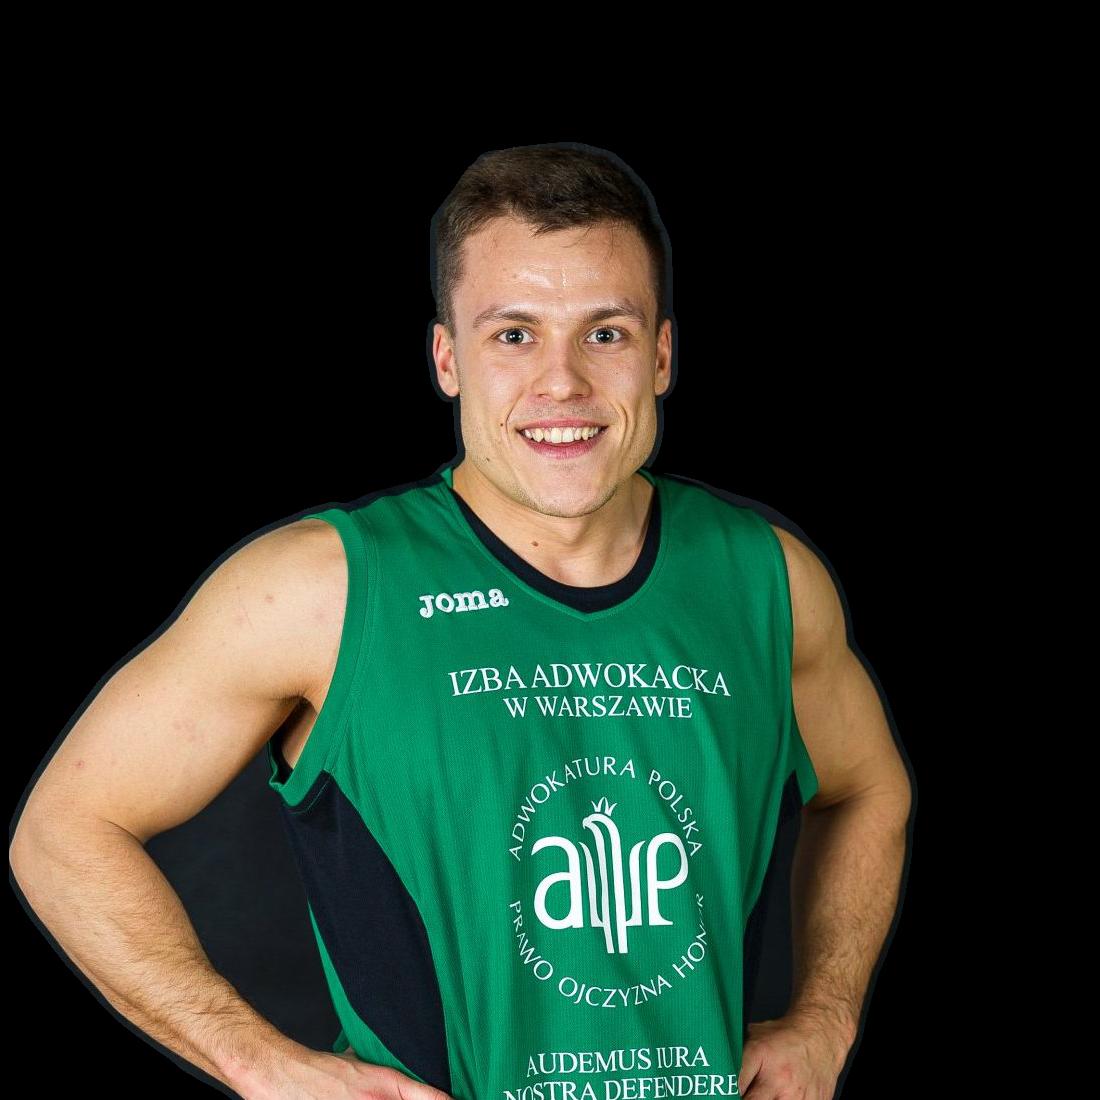 Marcin Ajs